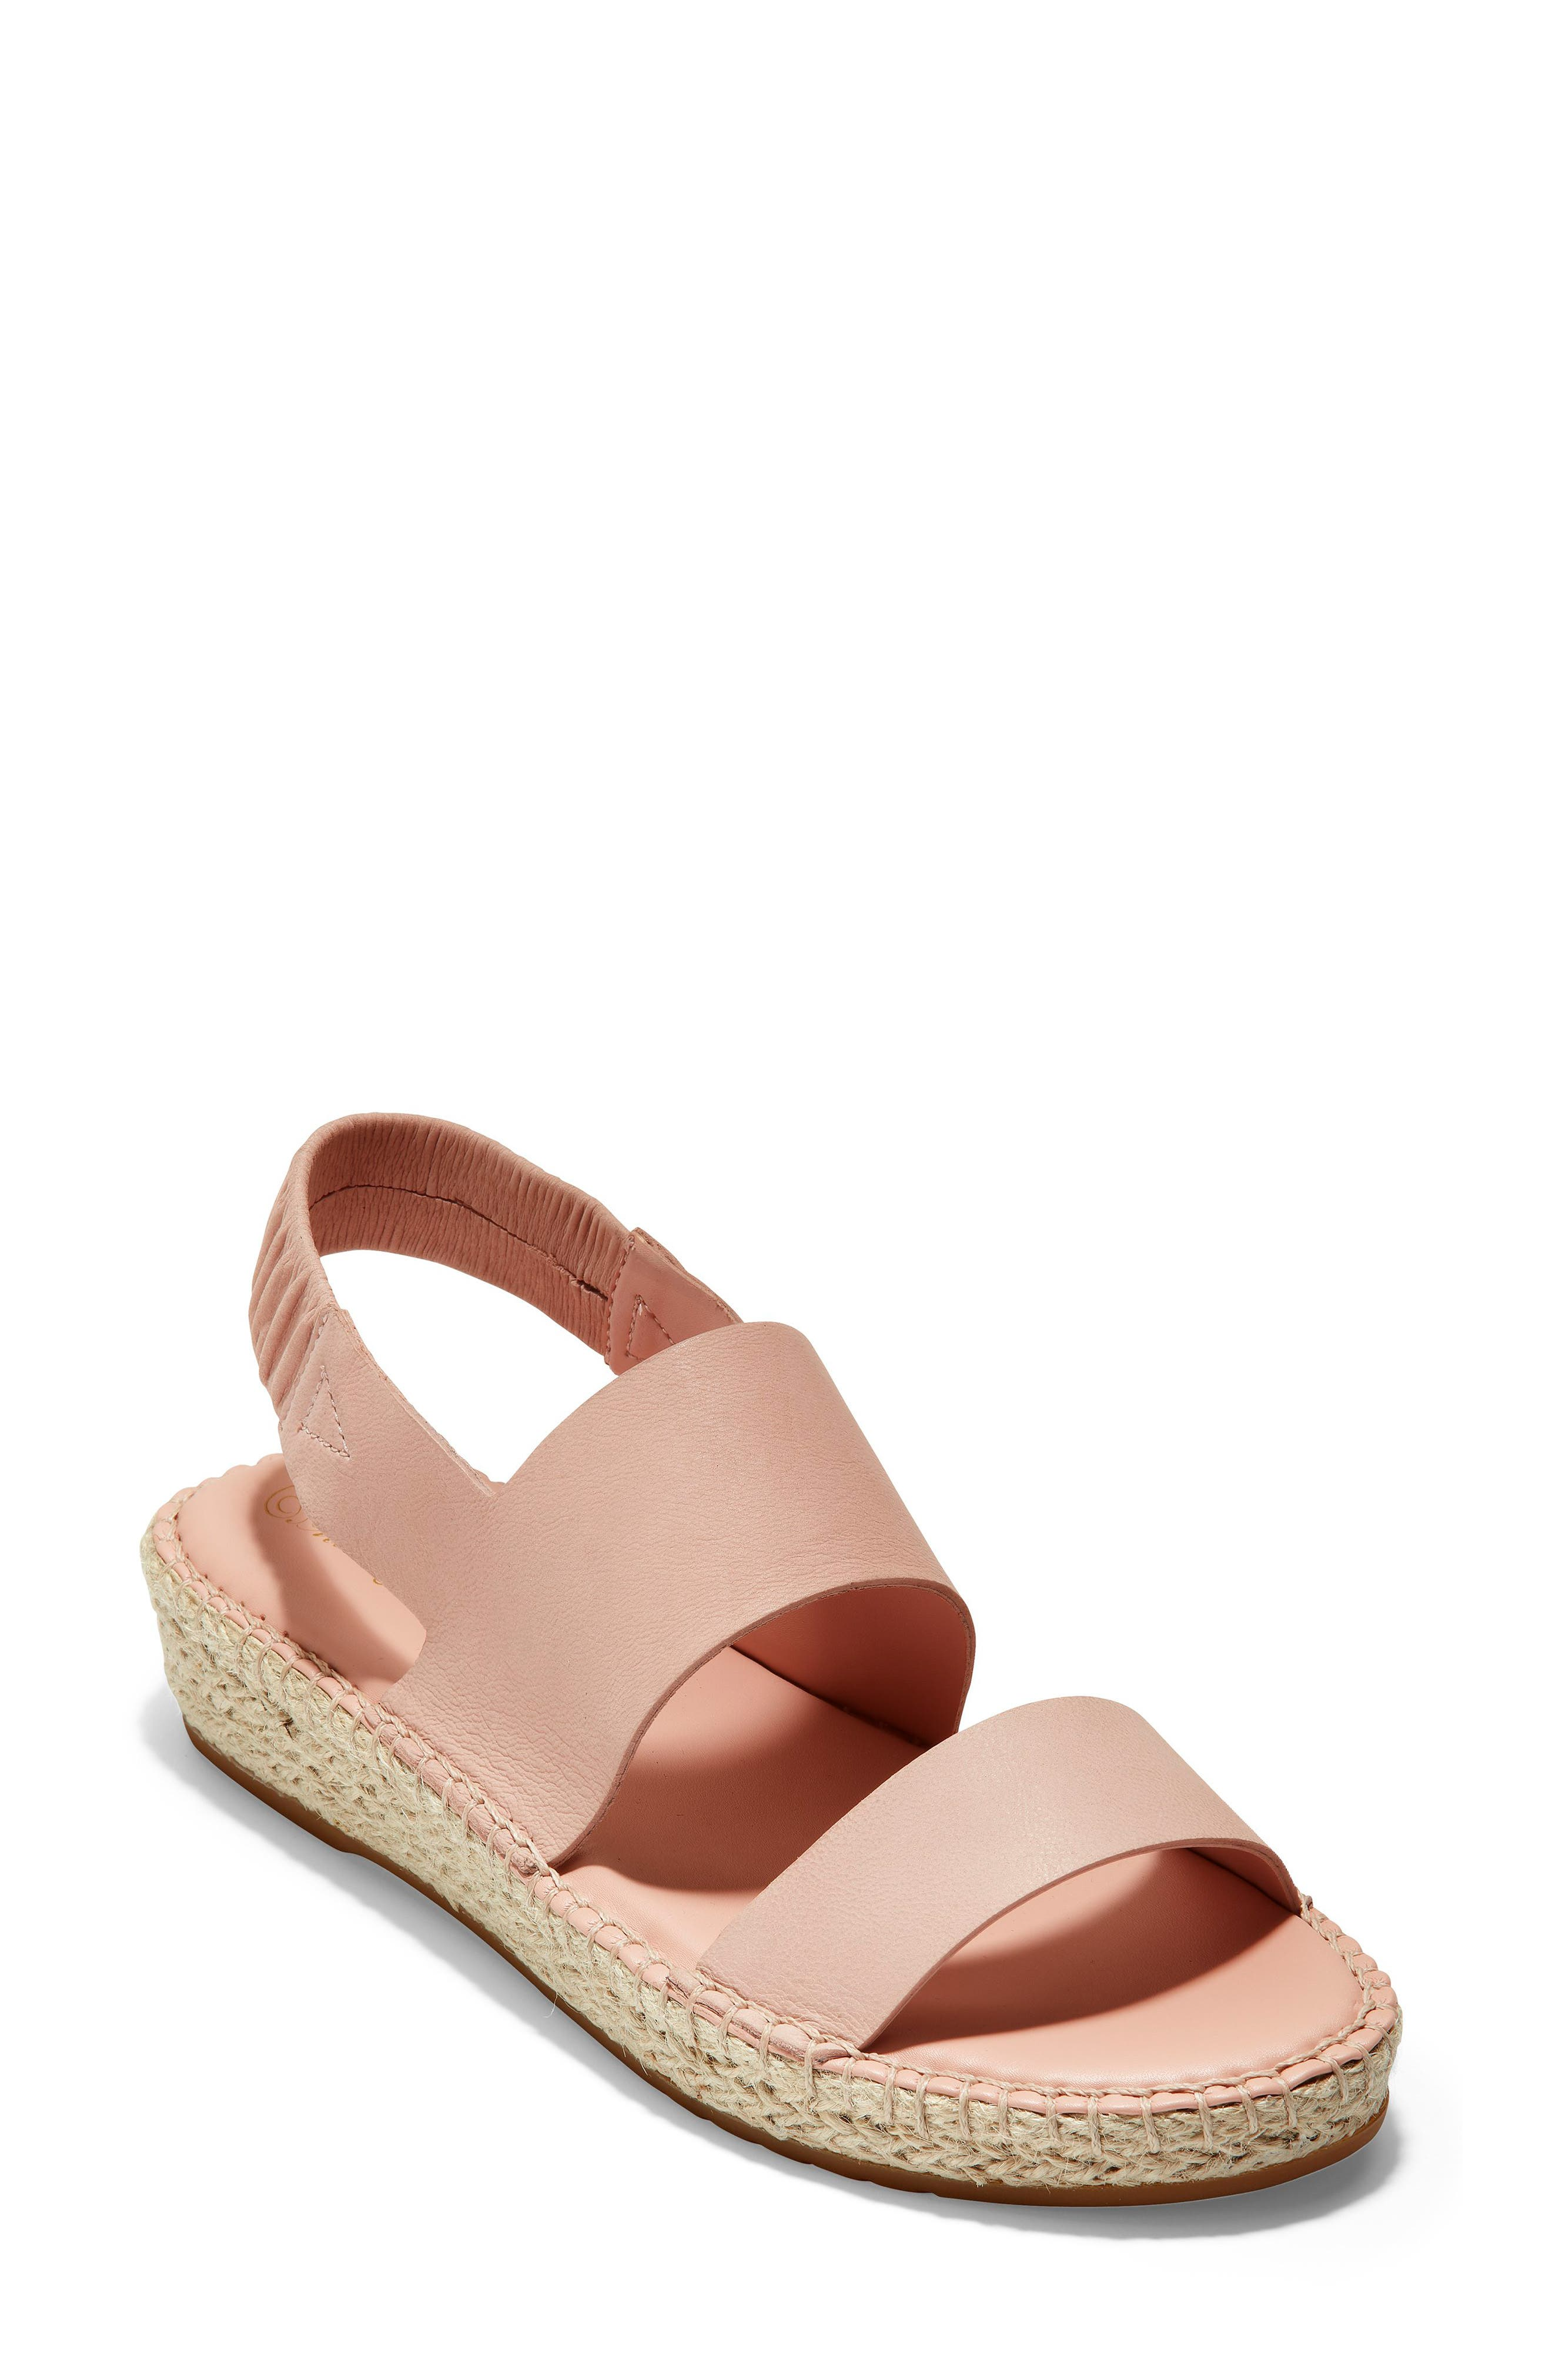 Little Girls Low Wedge Espadrille Woven Heels Floral Print Dress Shoes Sandals